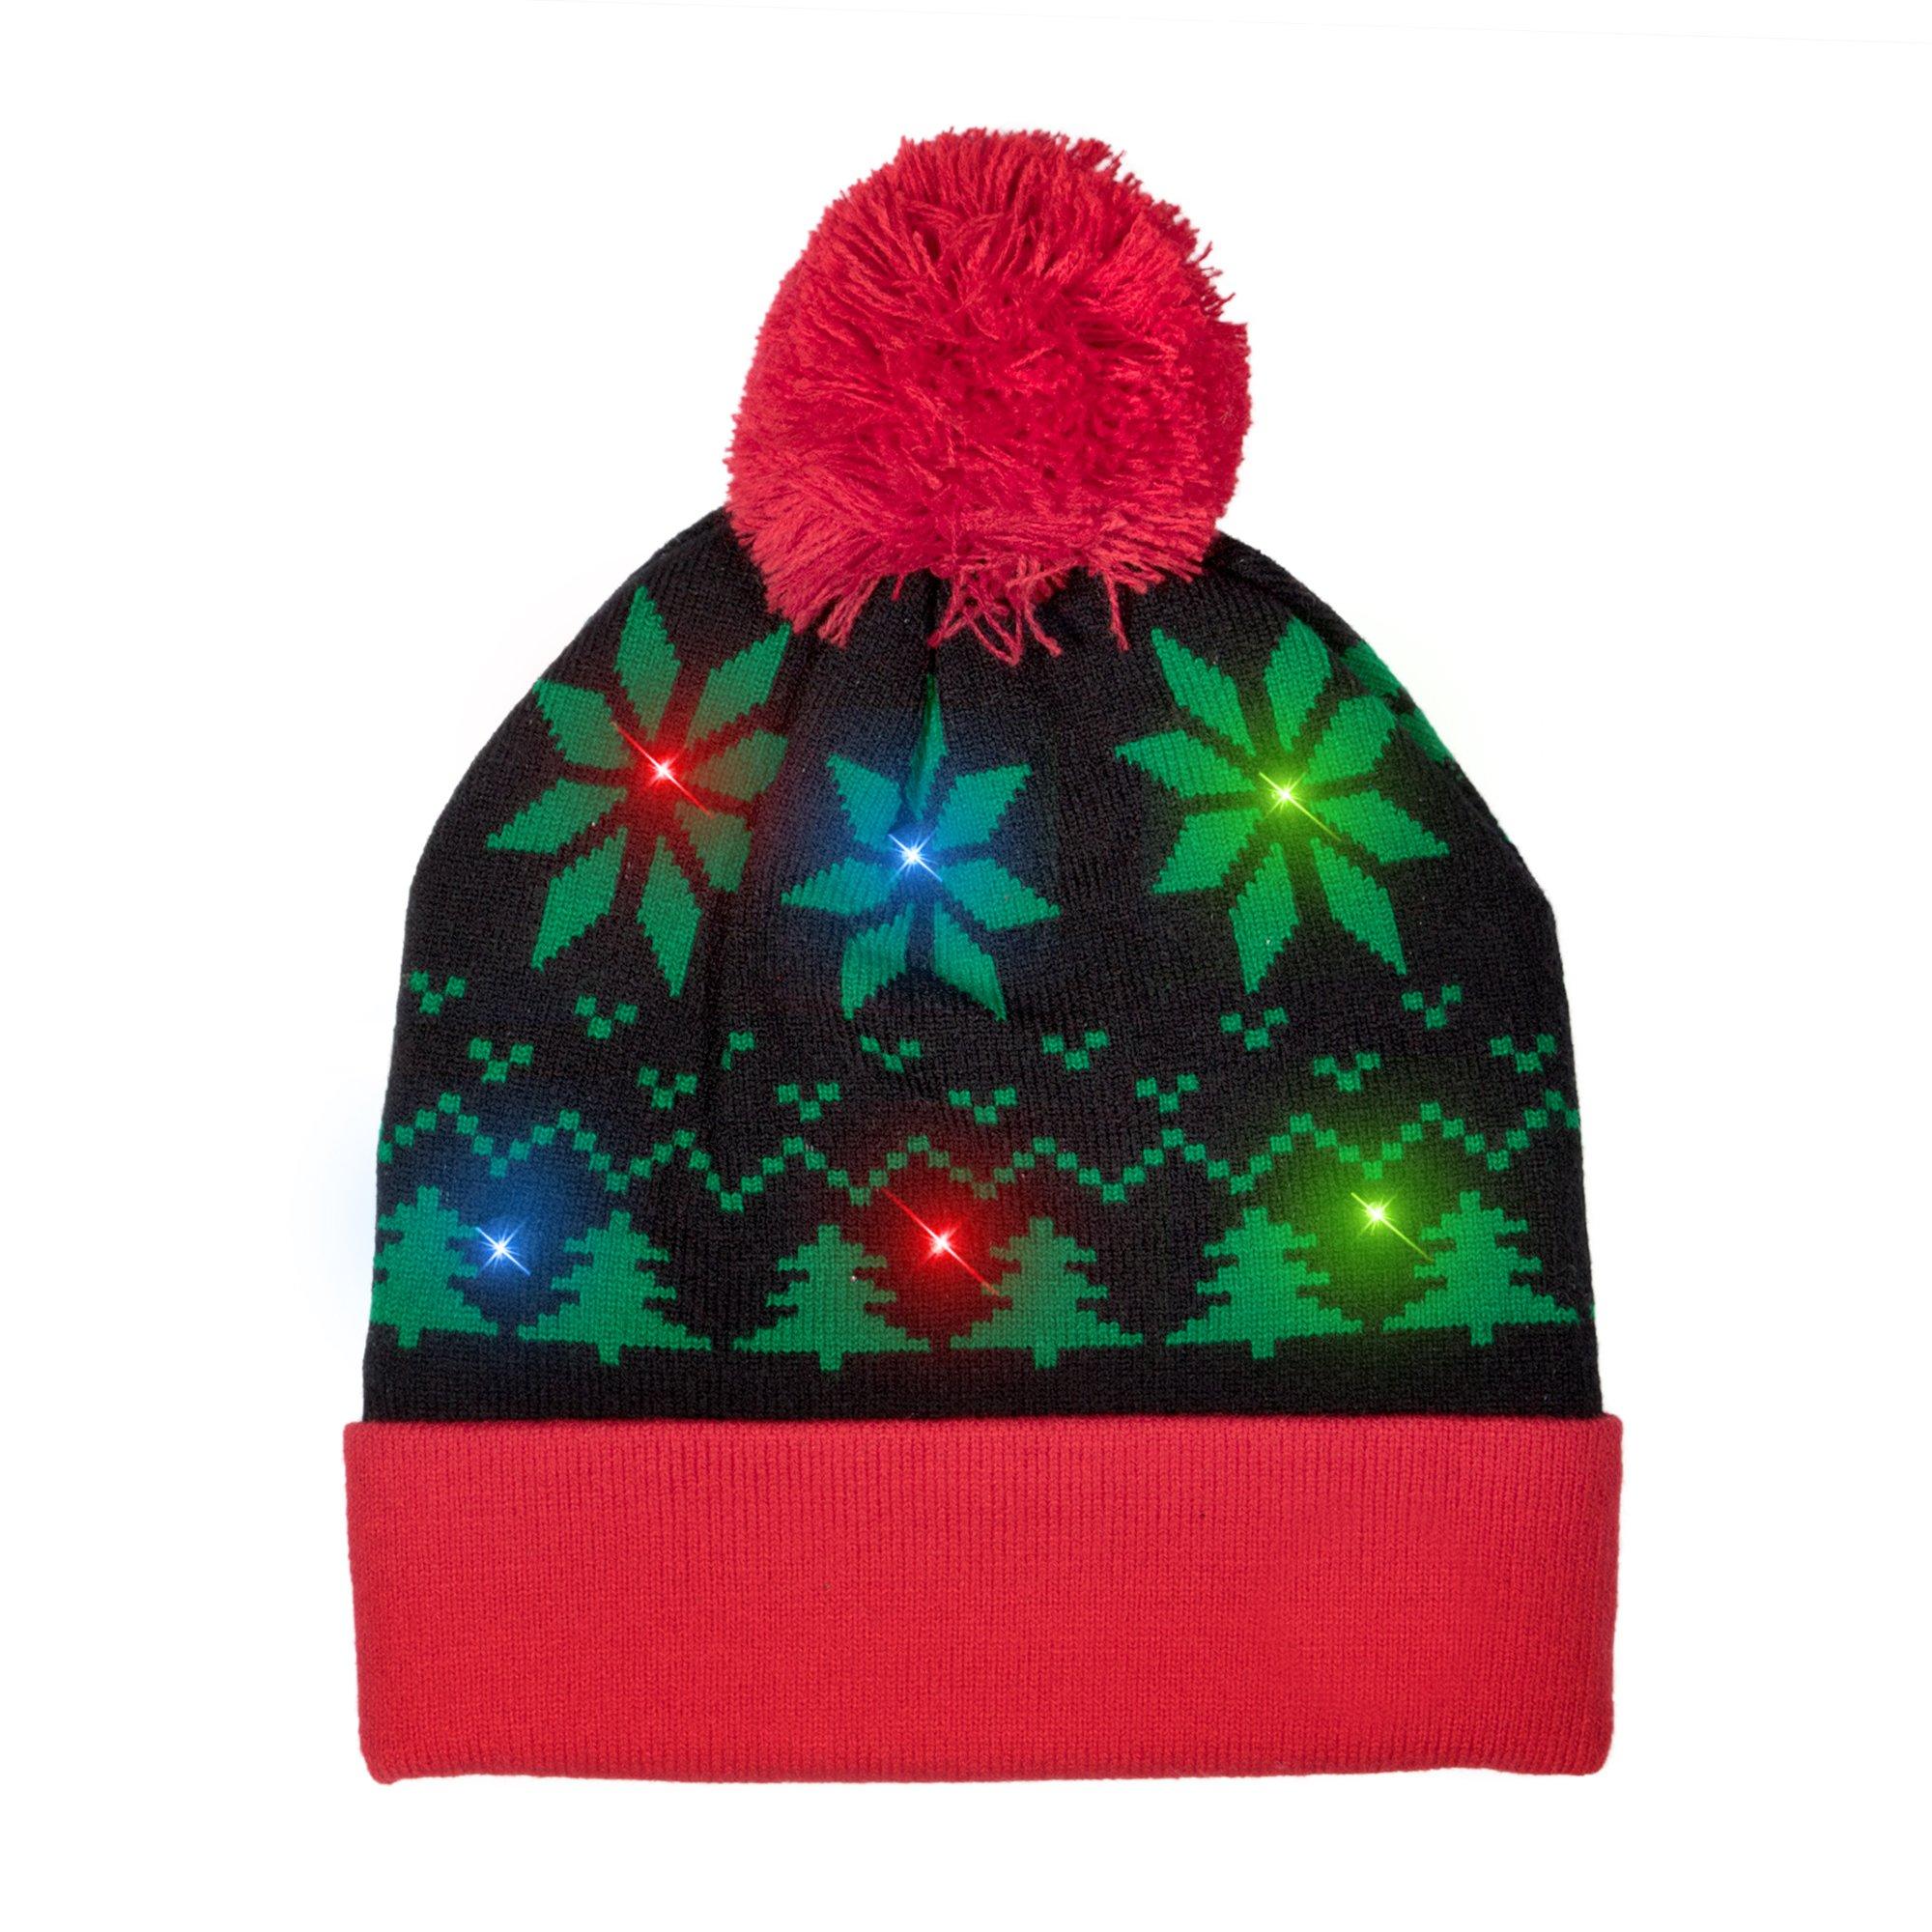 014046ea691690 Windy City Novelties LED Light-up Knitted Ugly Sweater Holiday Xmas  Christmas Beanie - 3